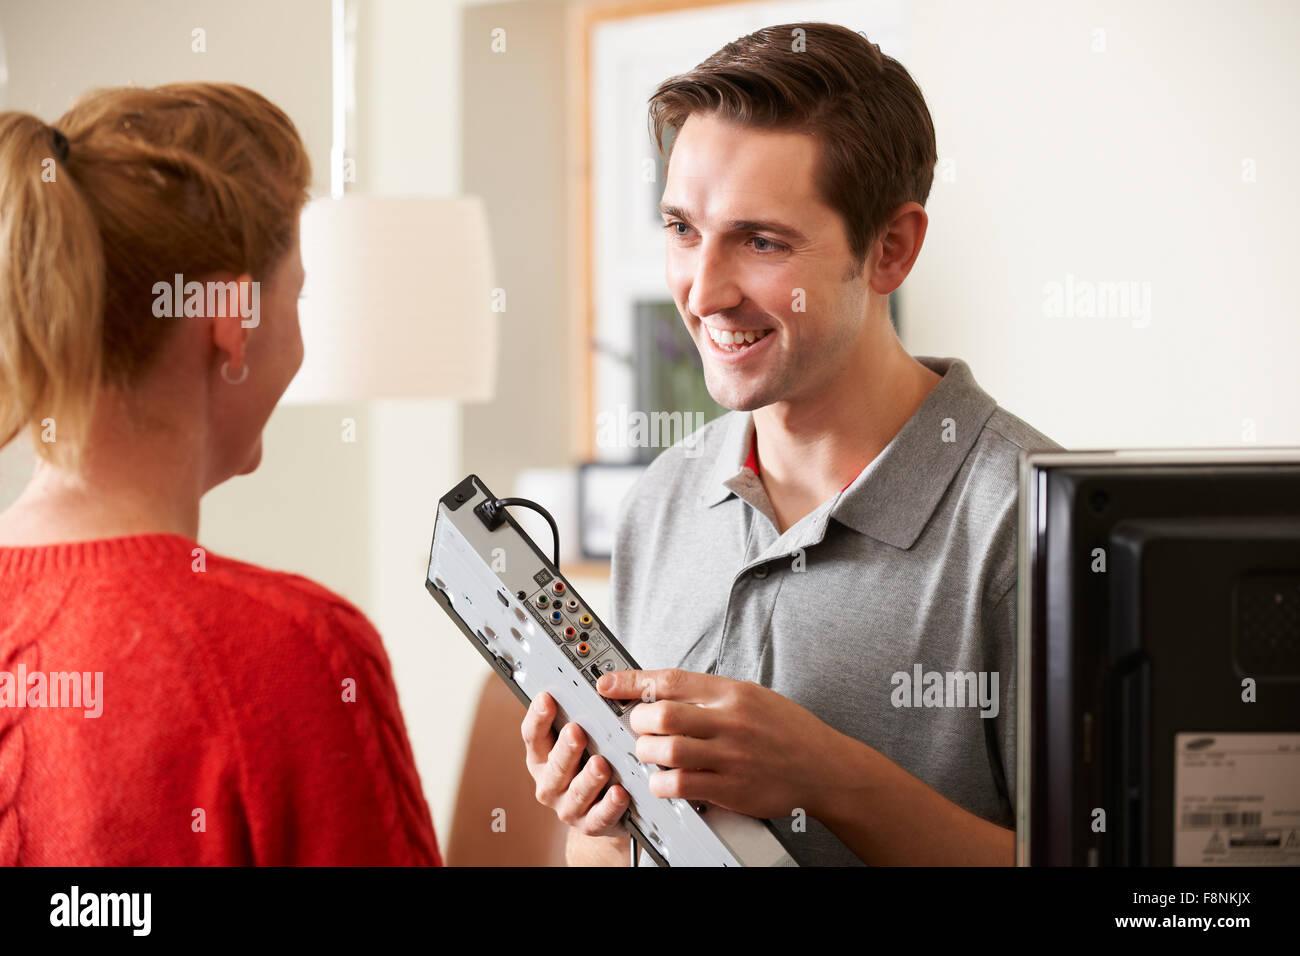 Engineer Giving Advice On Installing Digital TV Equipment - Stock Image